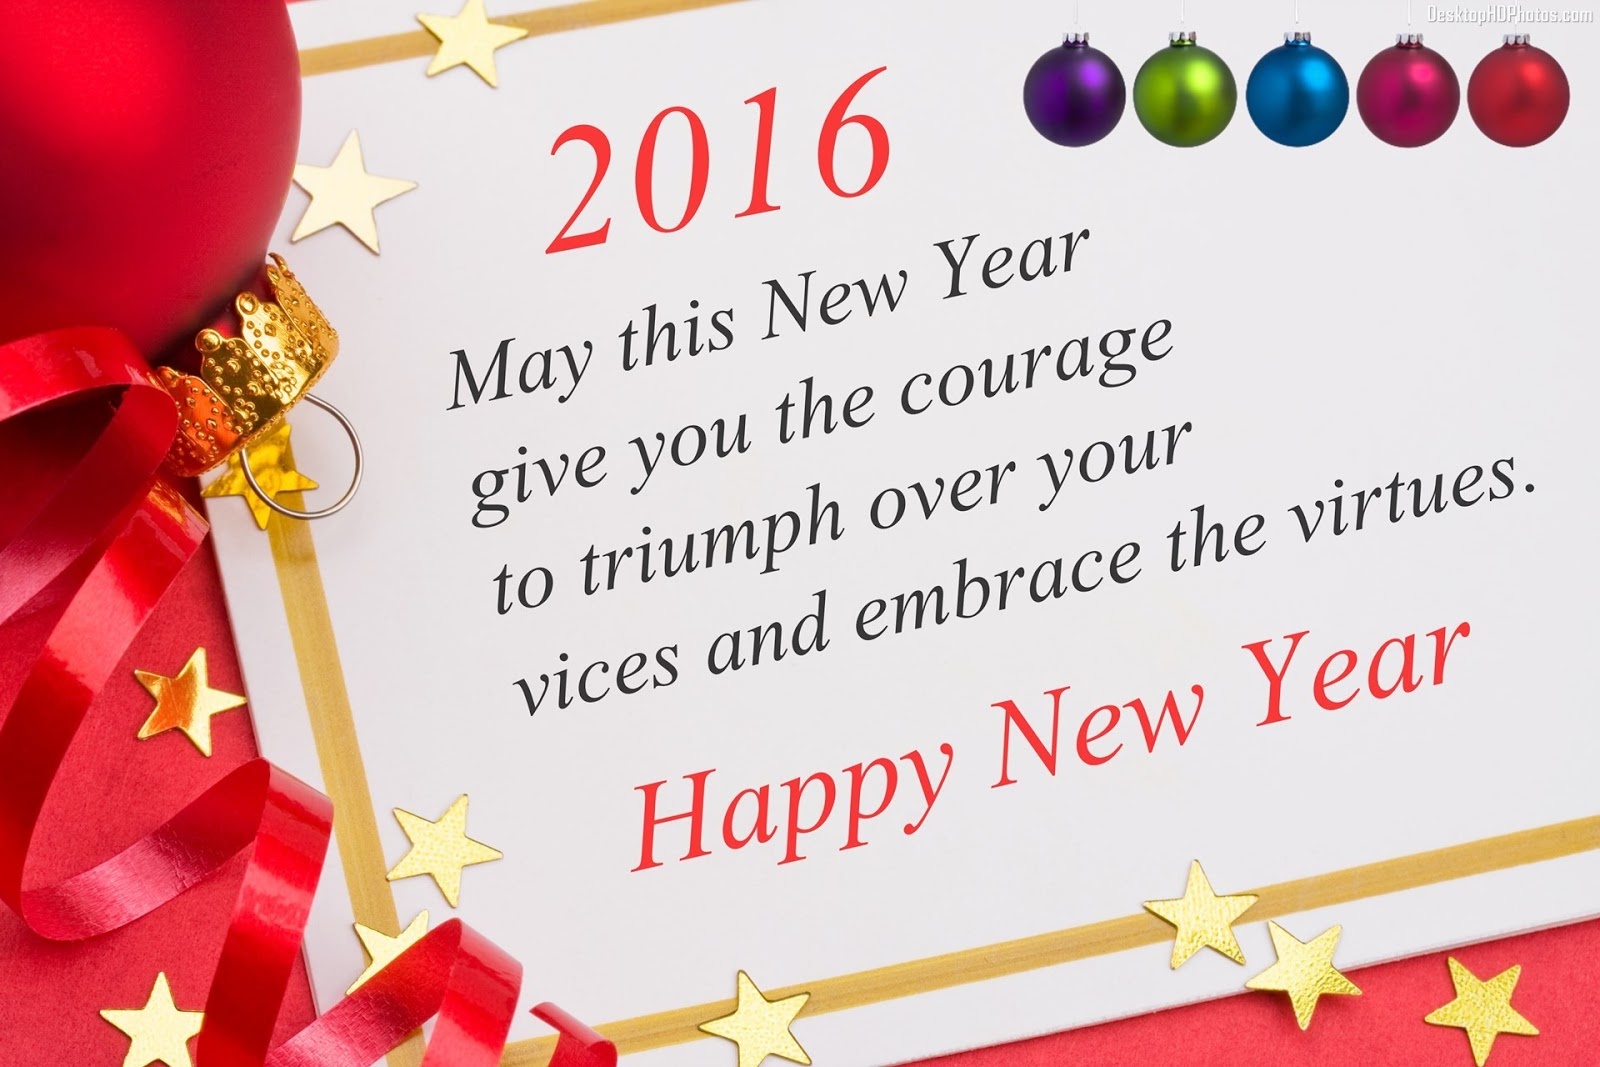 Bhupendra chahar happy new year 2016 greetings wishes quotes new year 2016 greetings wishes and messages m4hsunfo